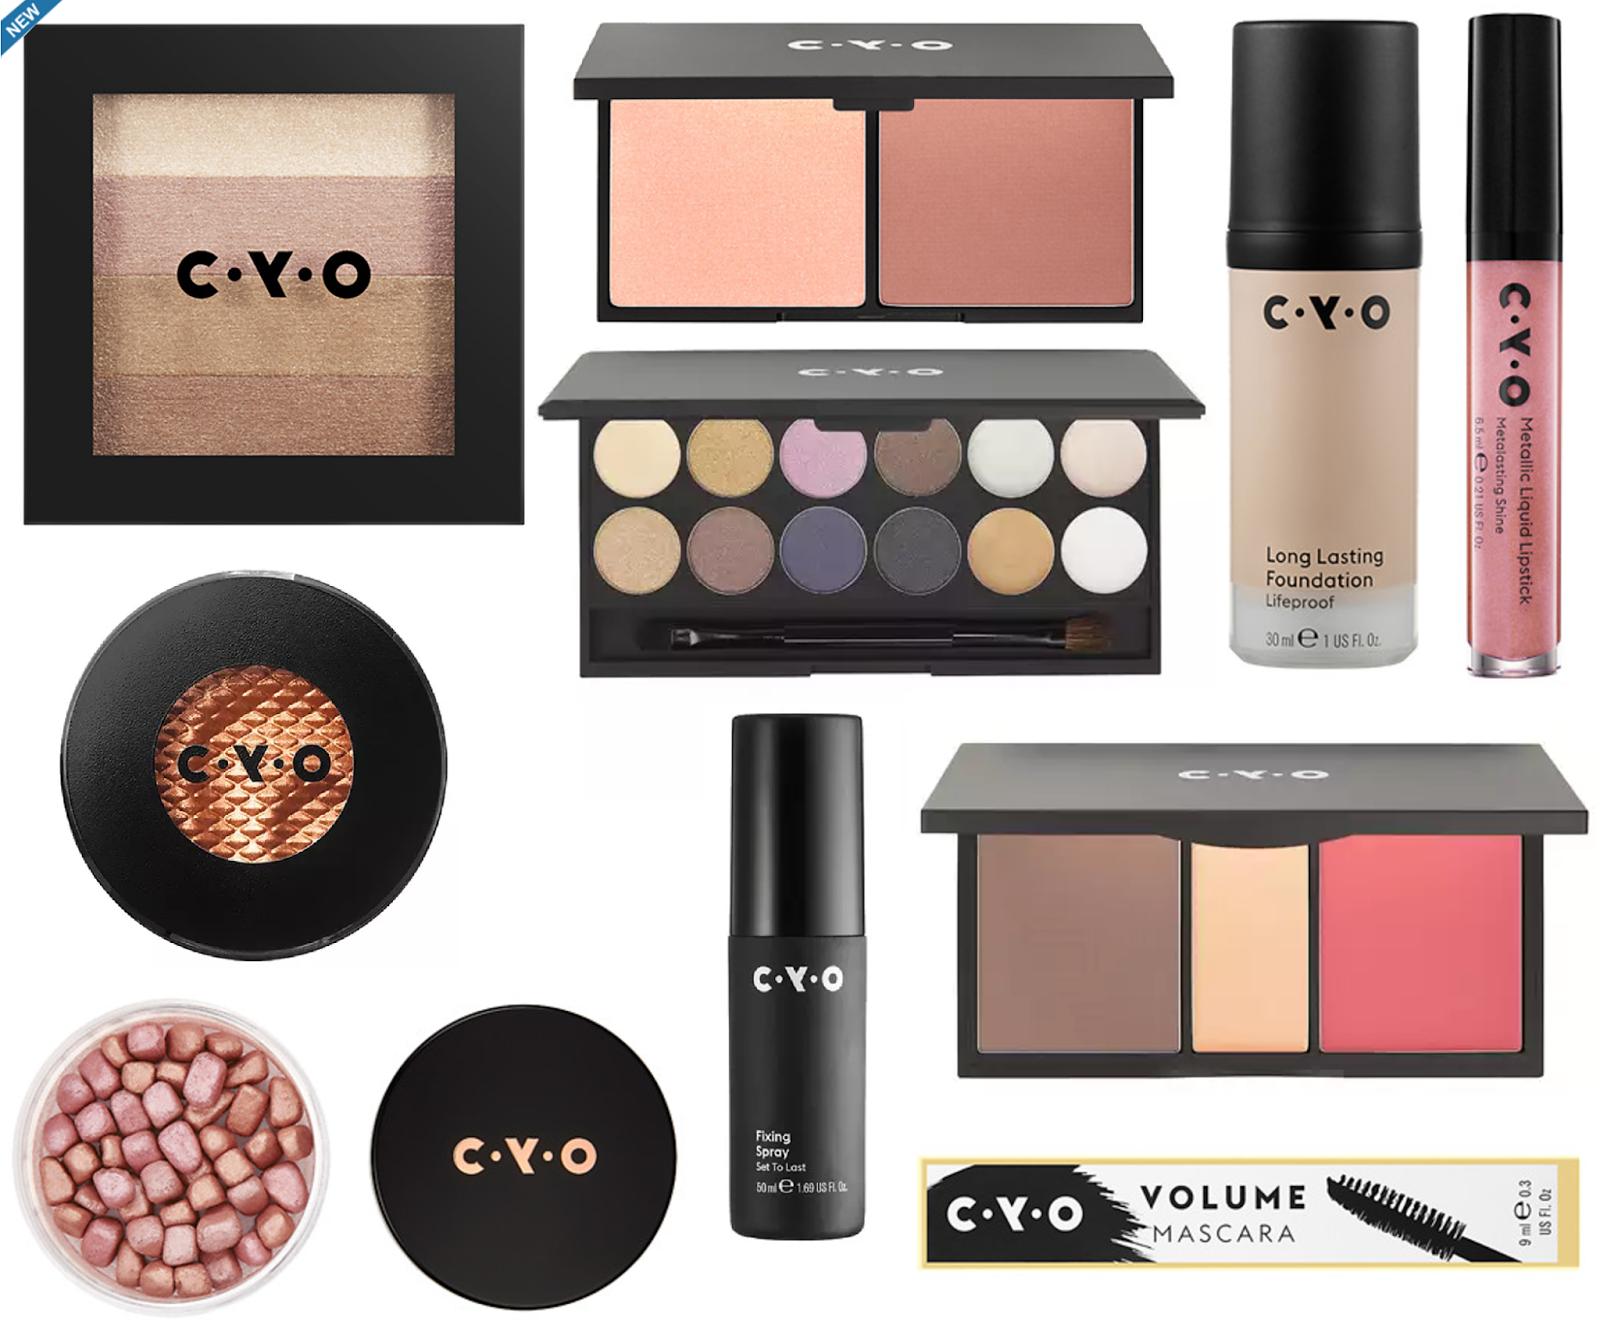 New Brand at Walgreens | C Y O  Cosmetics - Beauddiction